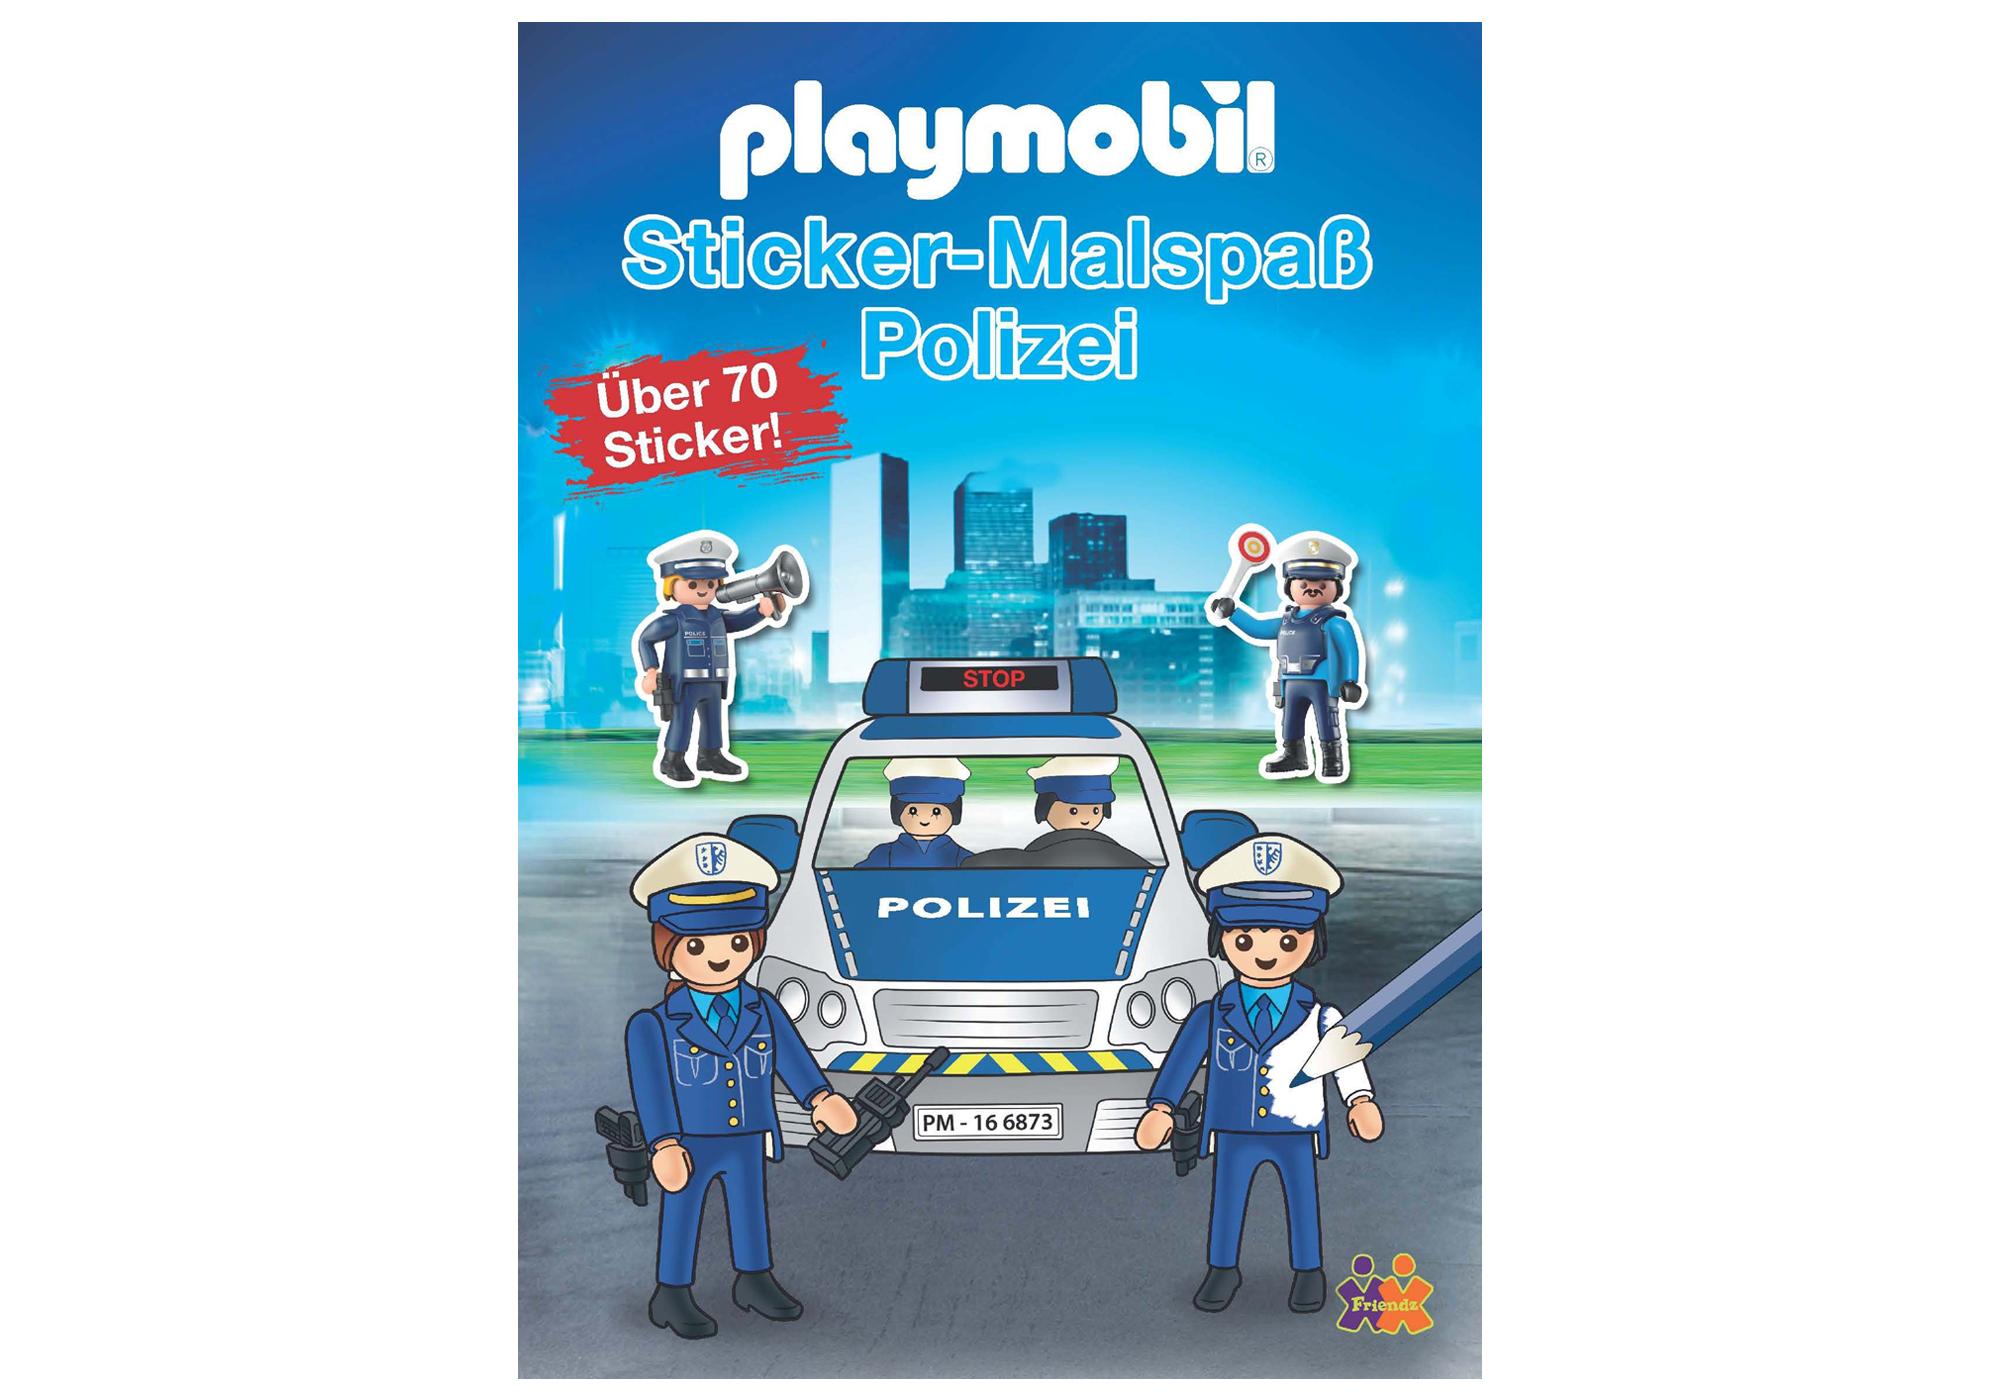 http://media.playmobil.com/i/playmobil/80093_product_detail